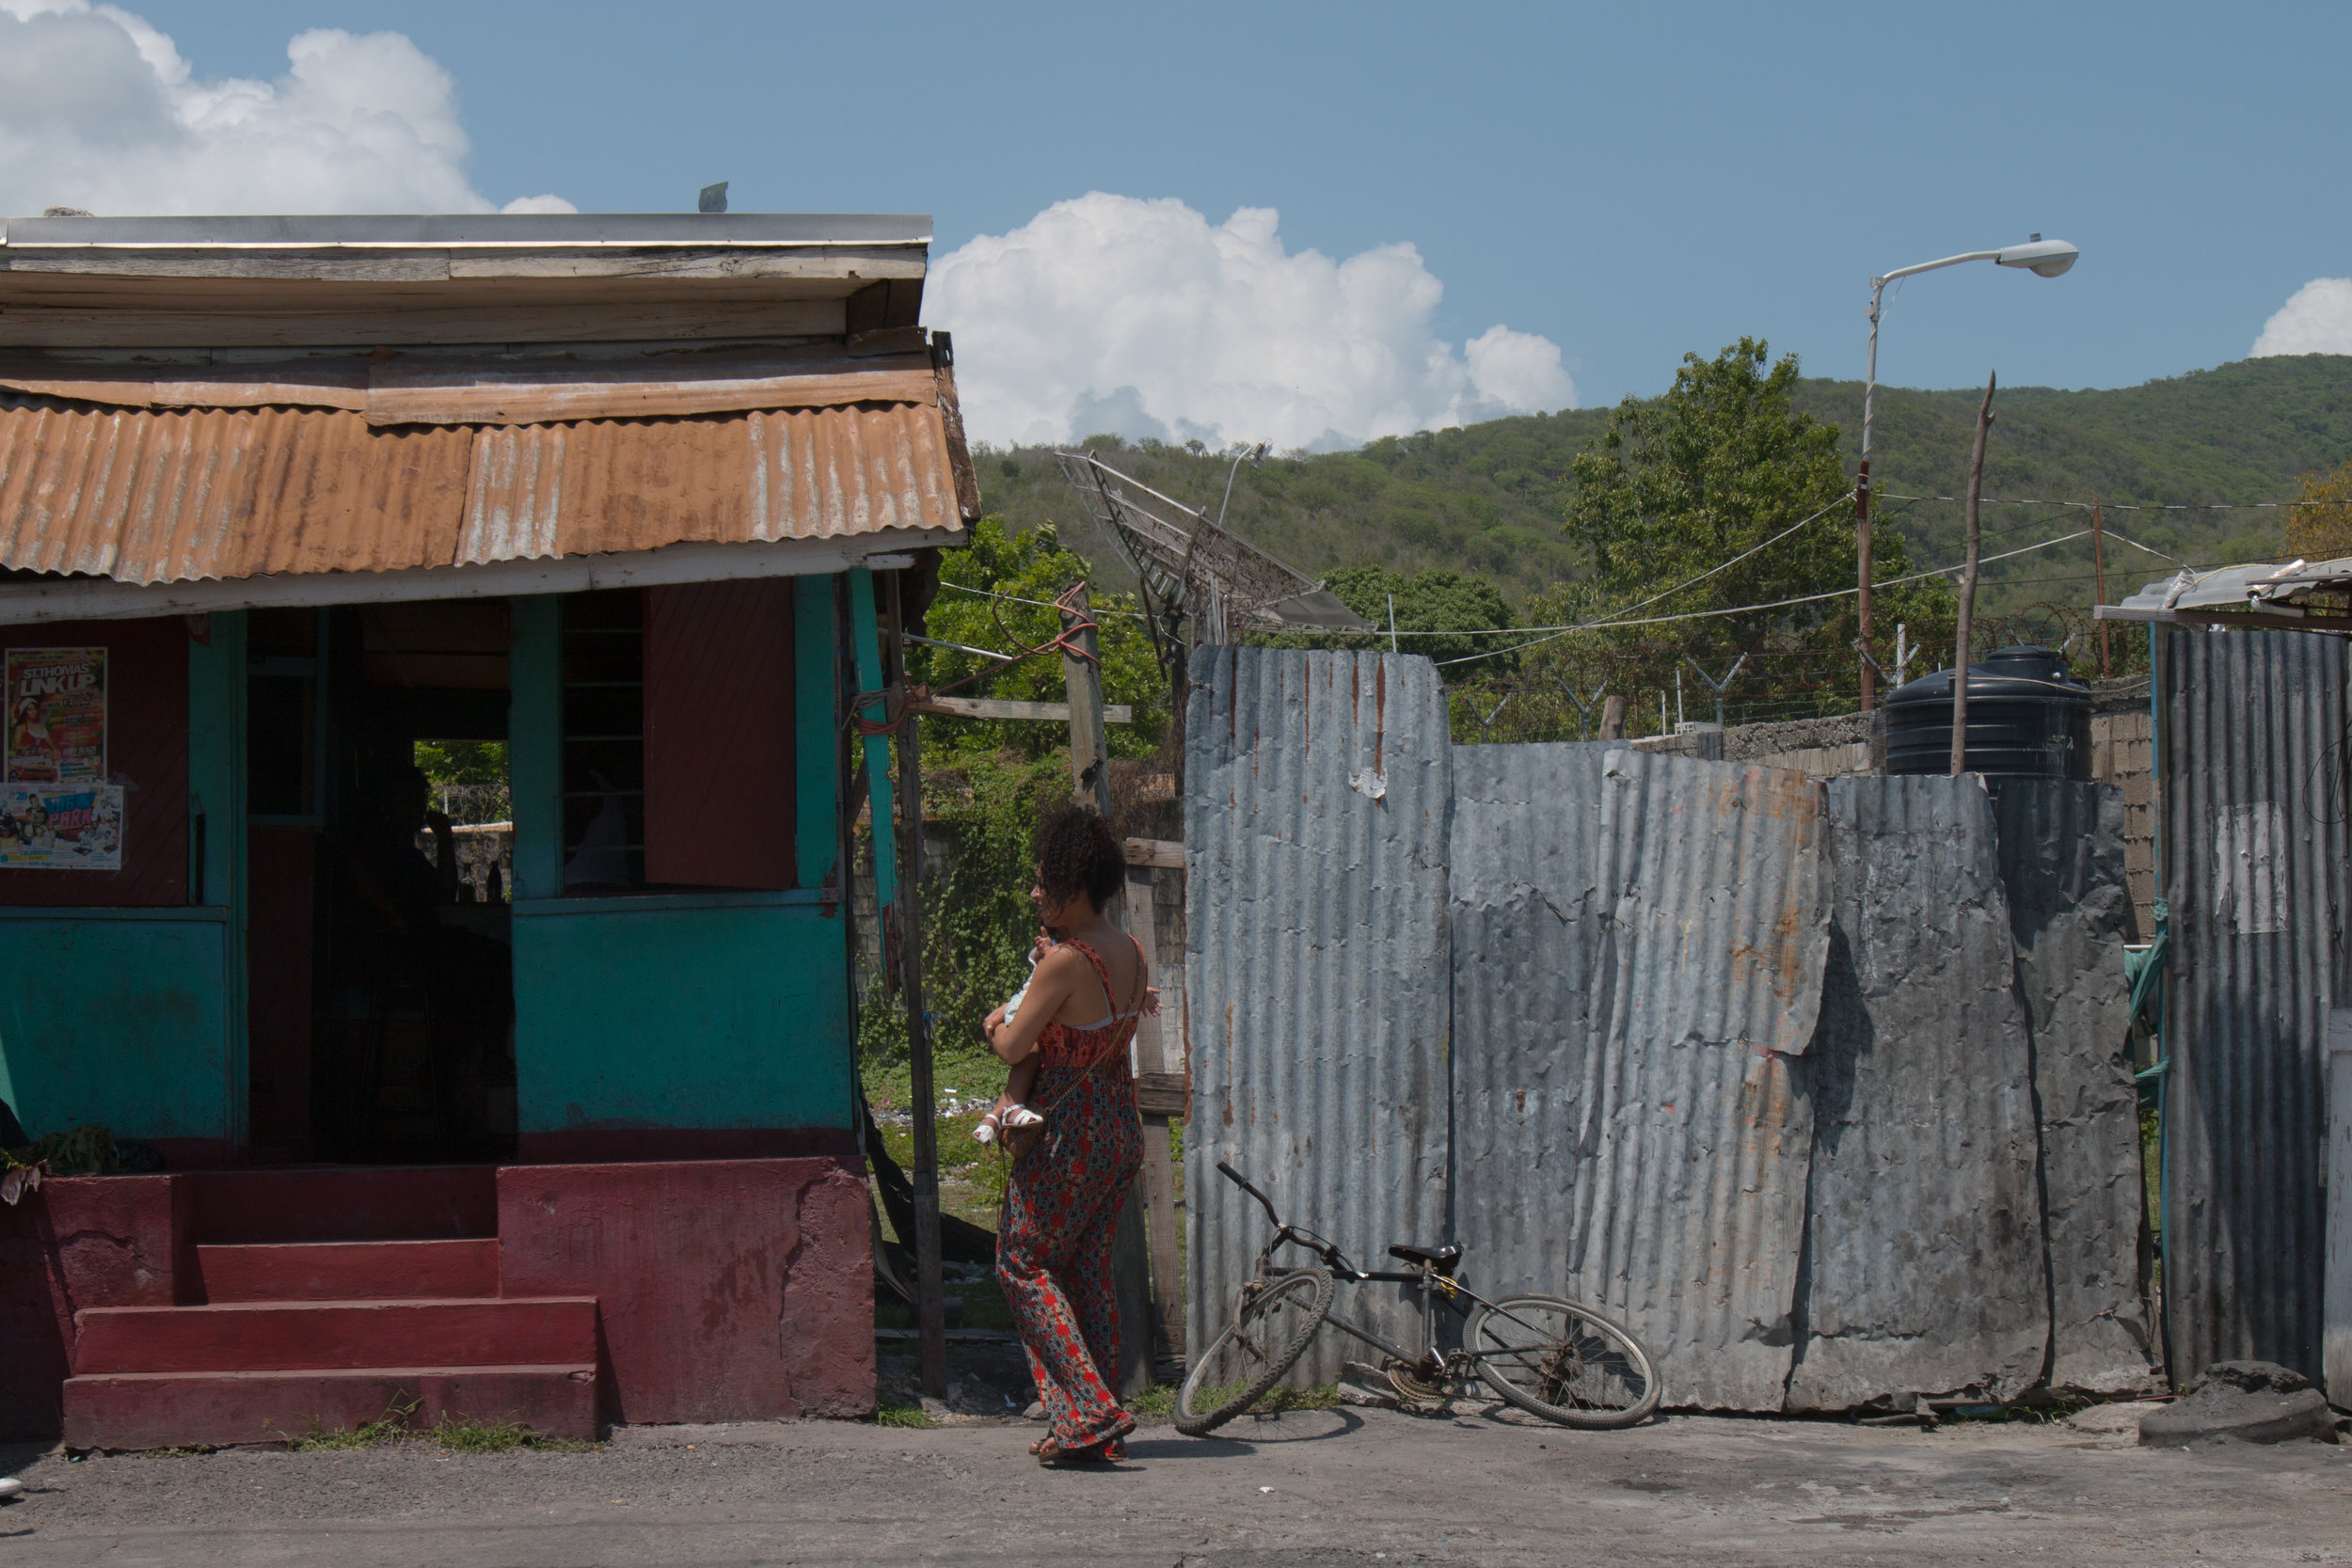 Jamaica edits for blog-8.jpg